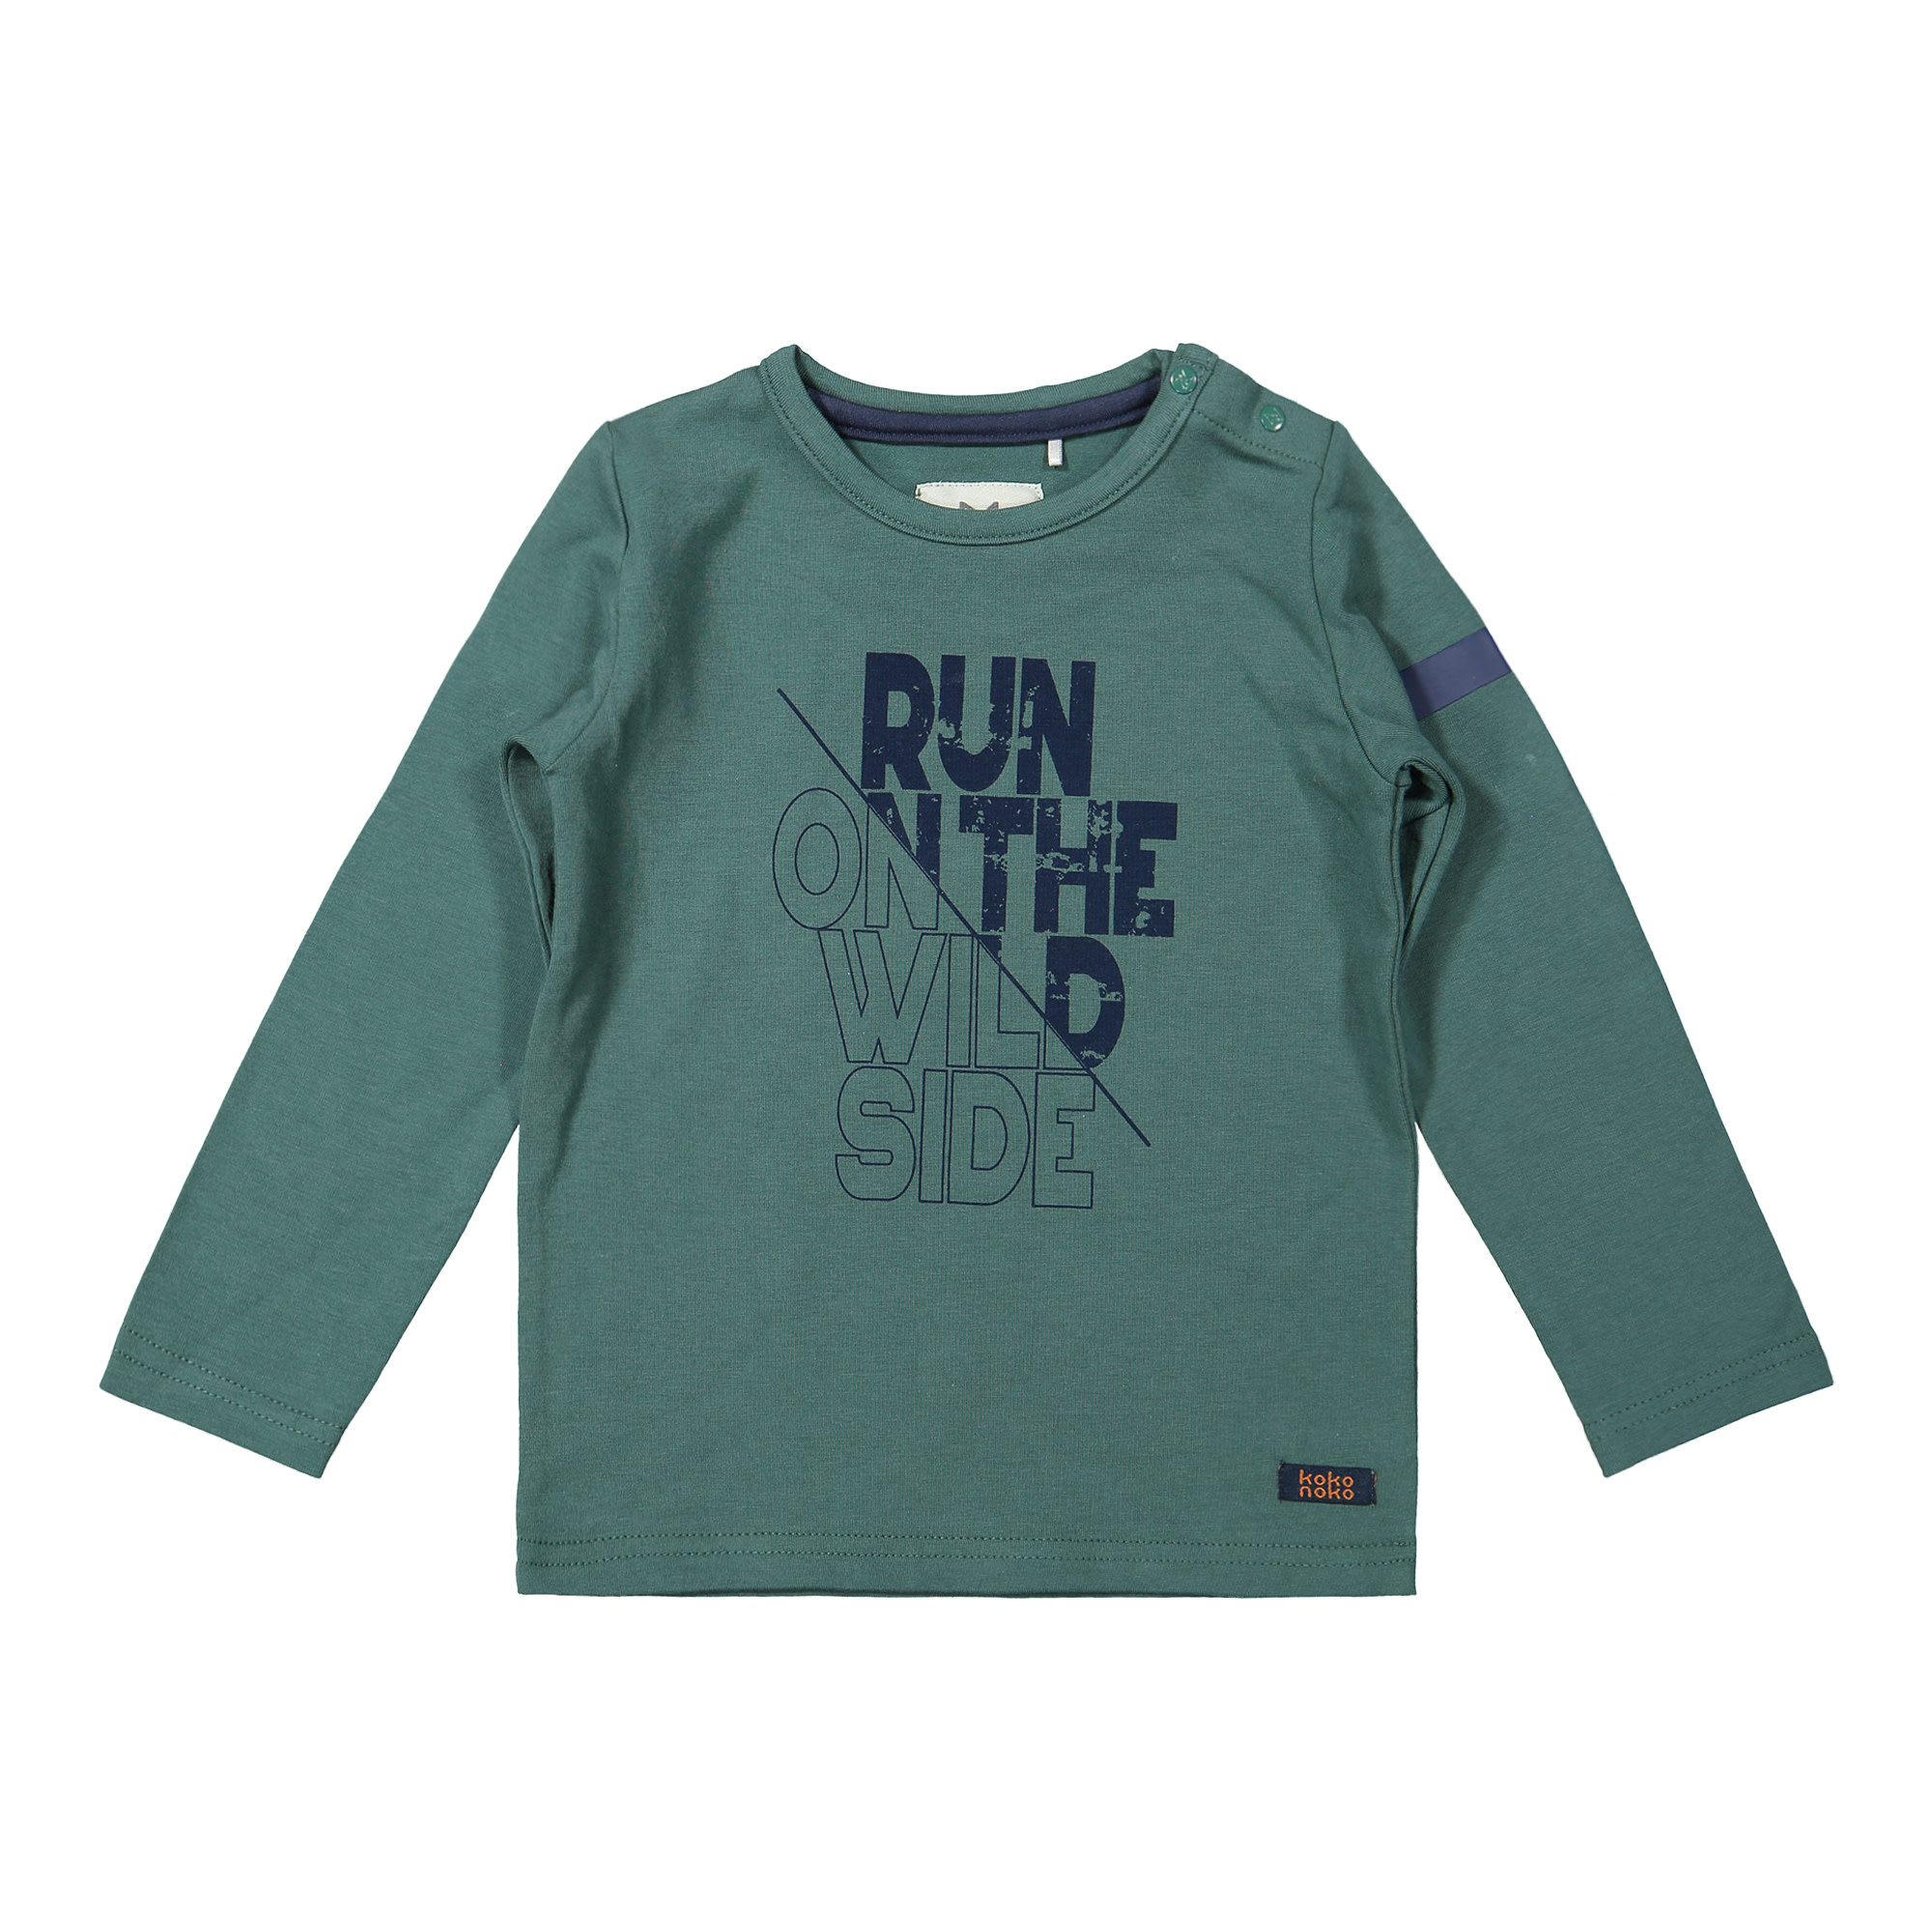 Run On the Wild Side Long Sleeve Tee